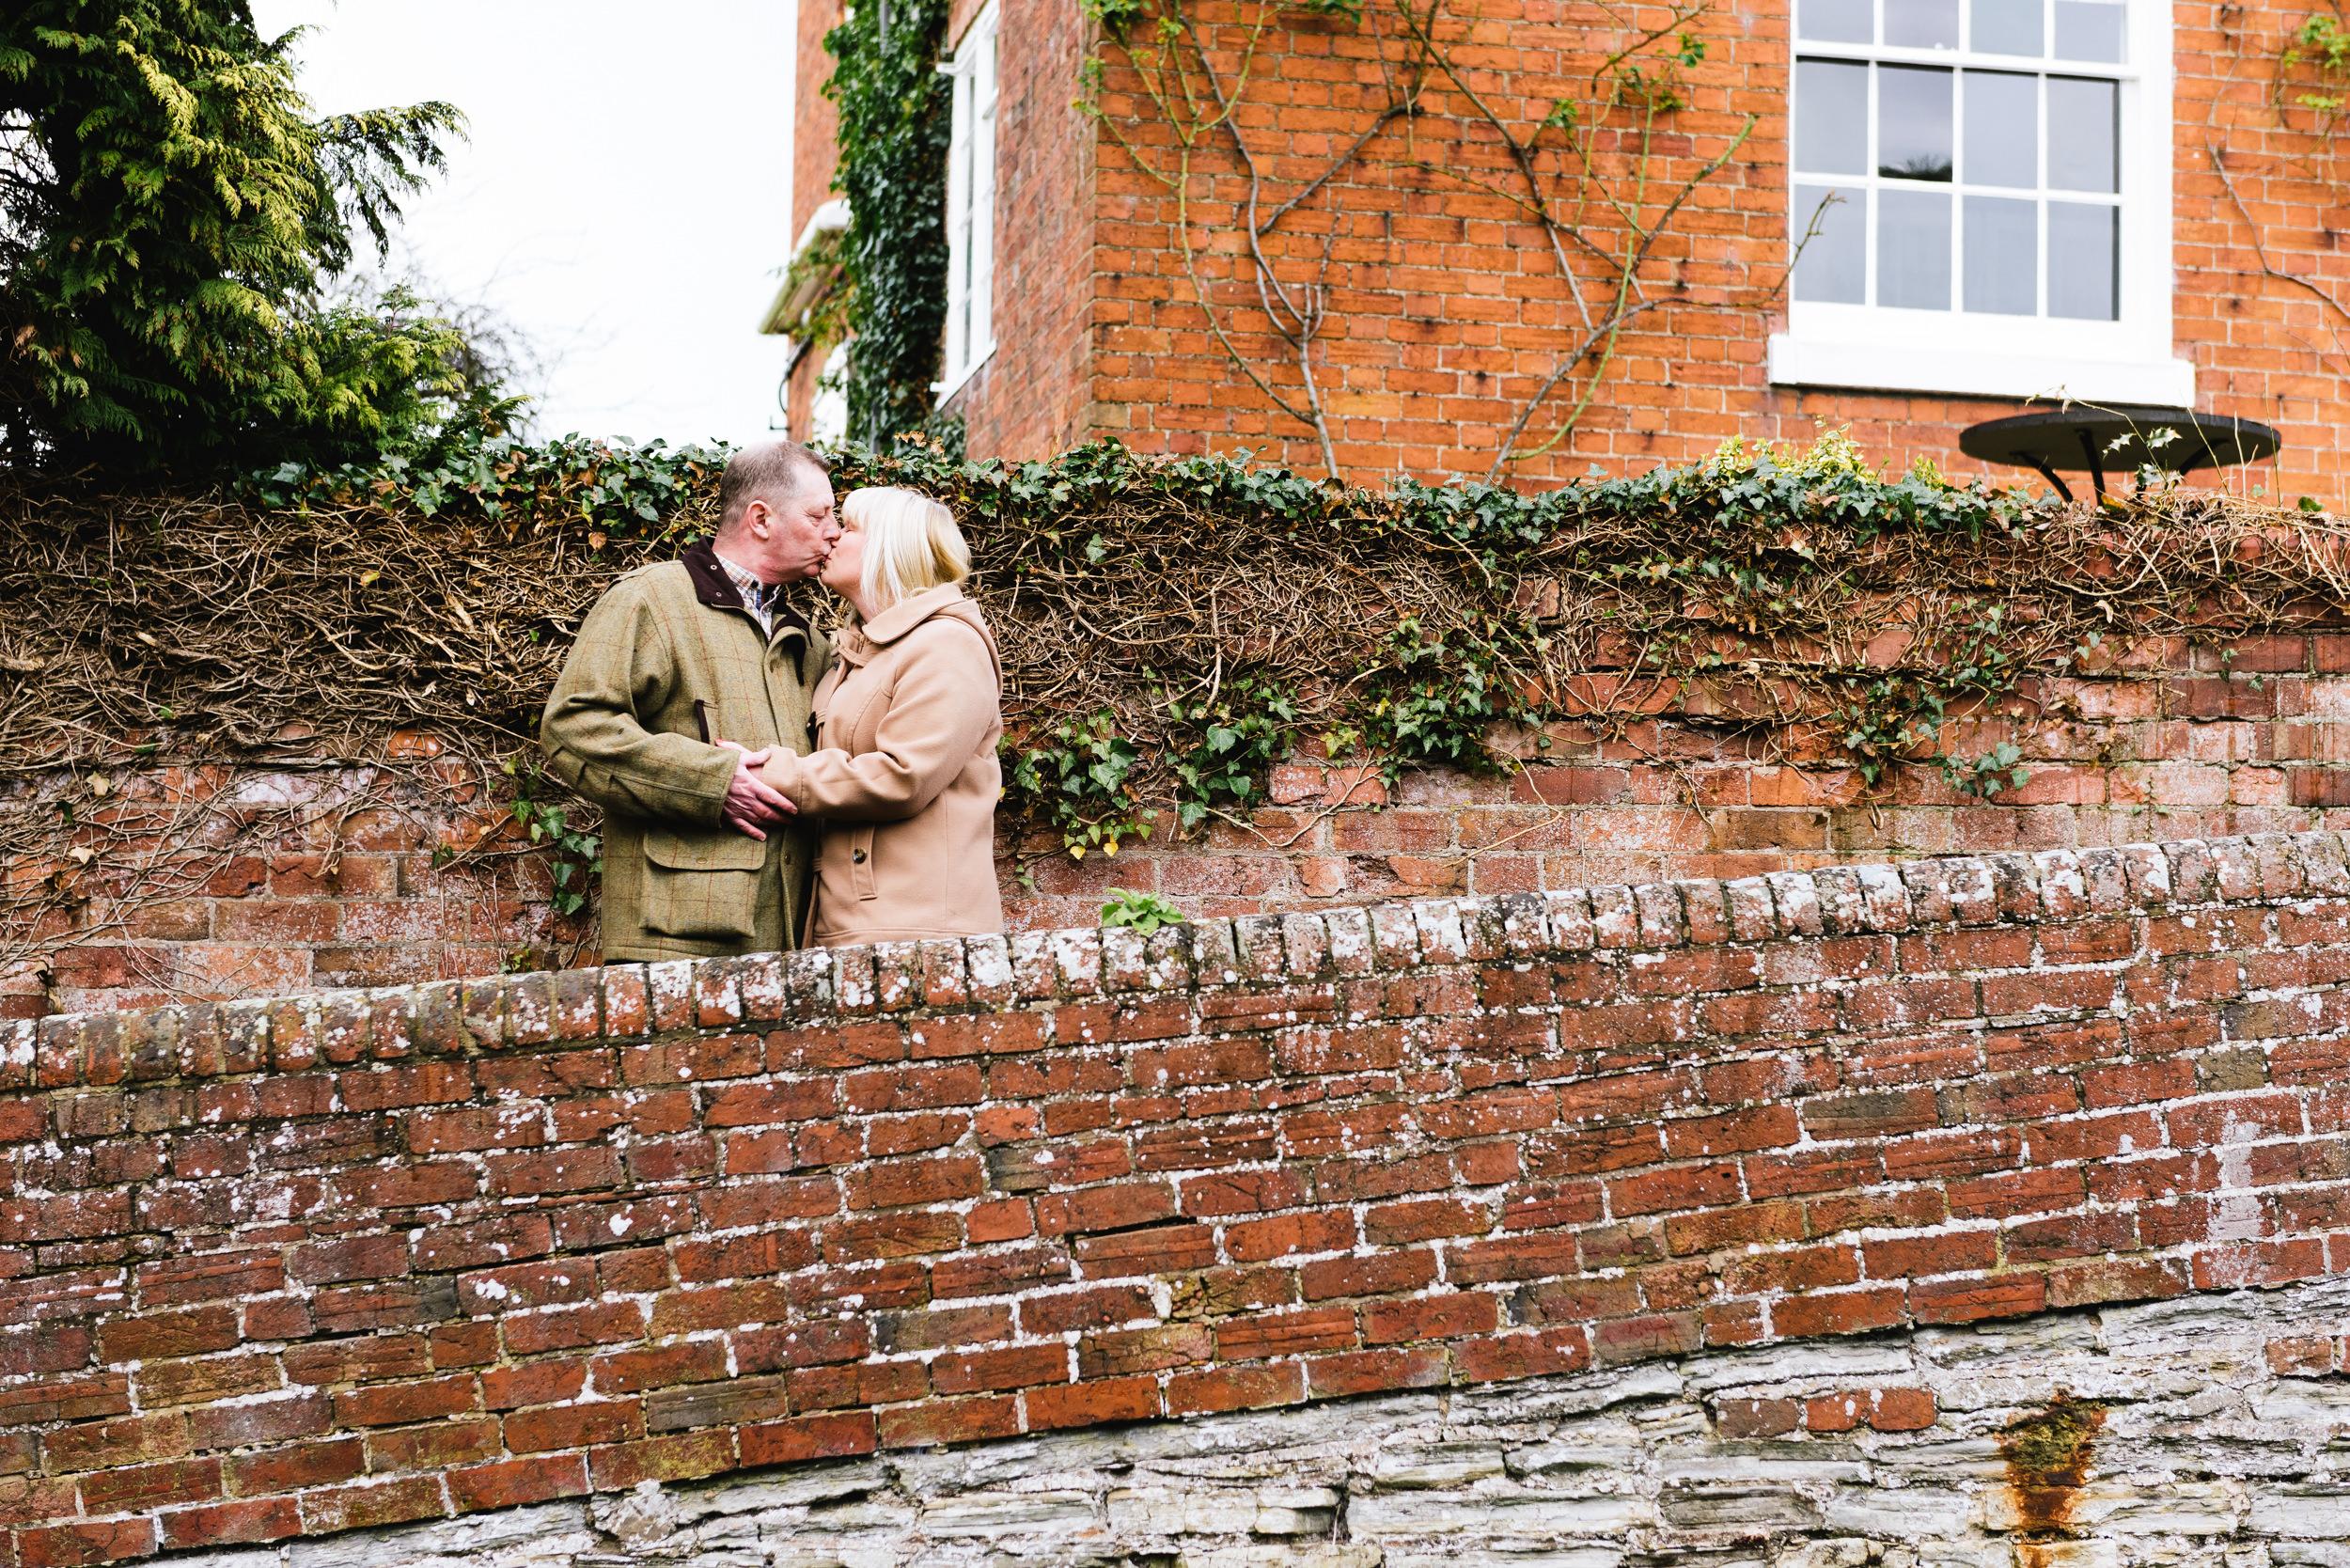 Older couple kissing stood on zig-zag outdoor brick steps